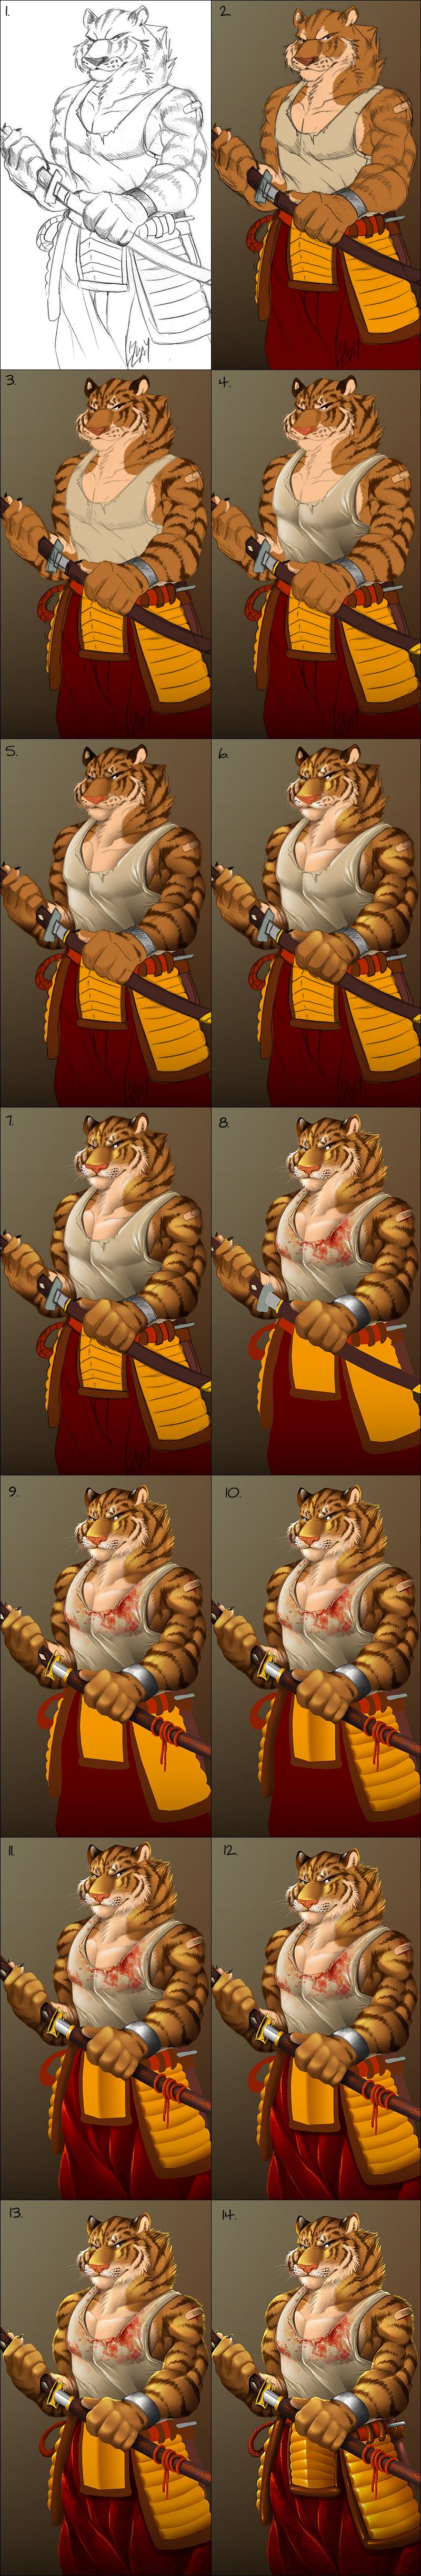 Urban Tiger Warrior - steps